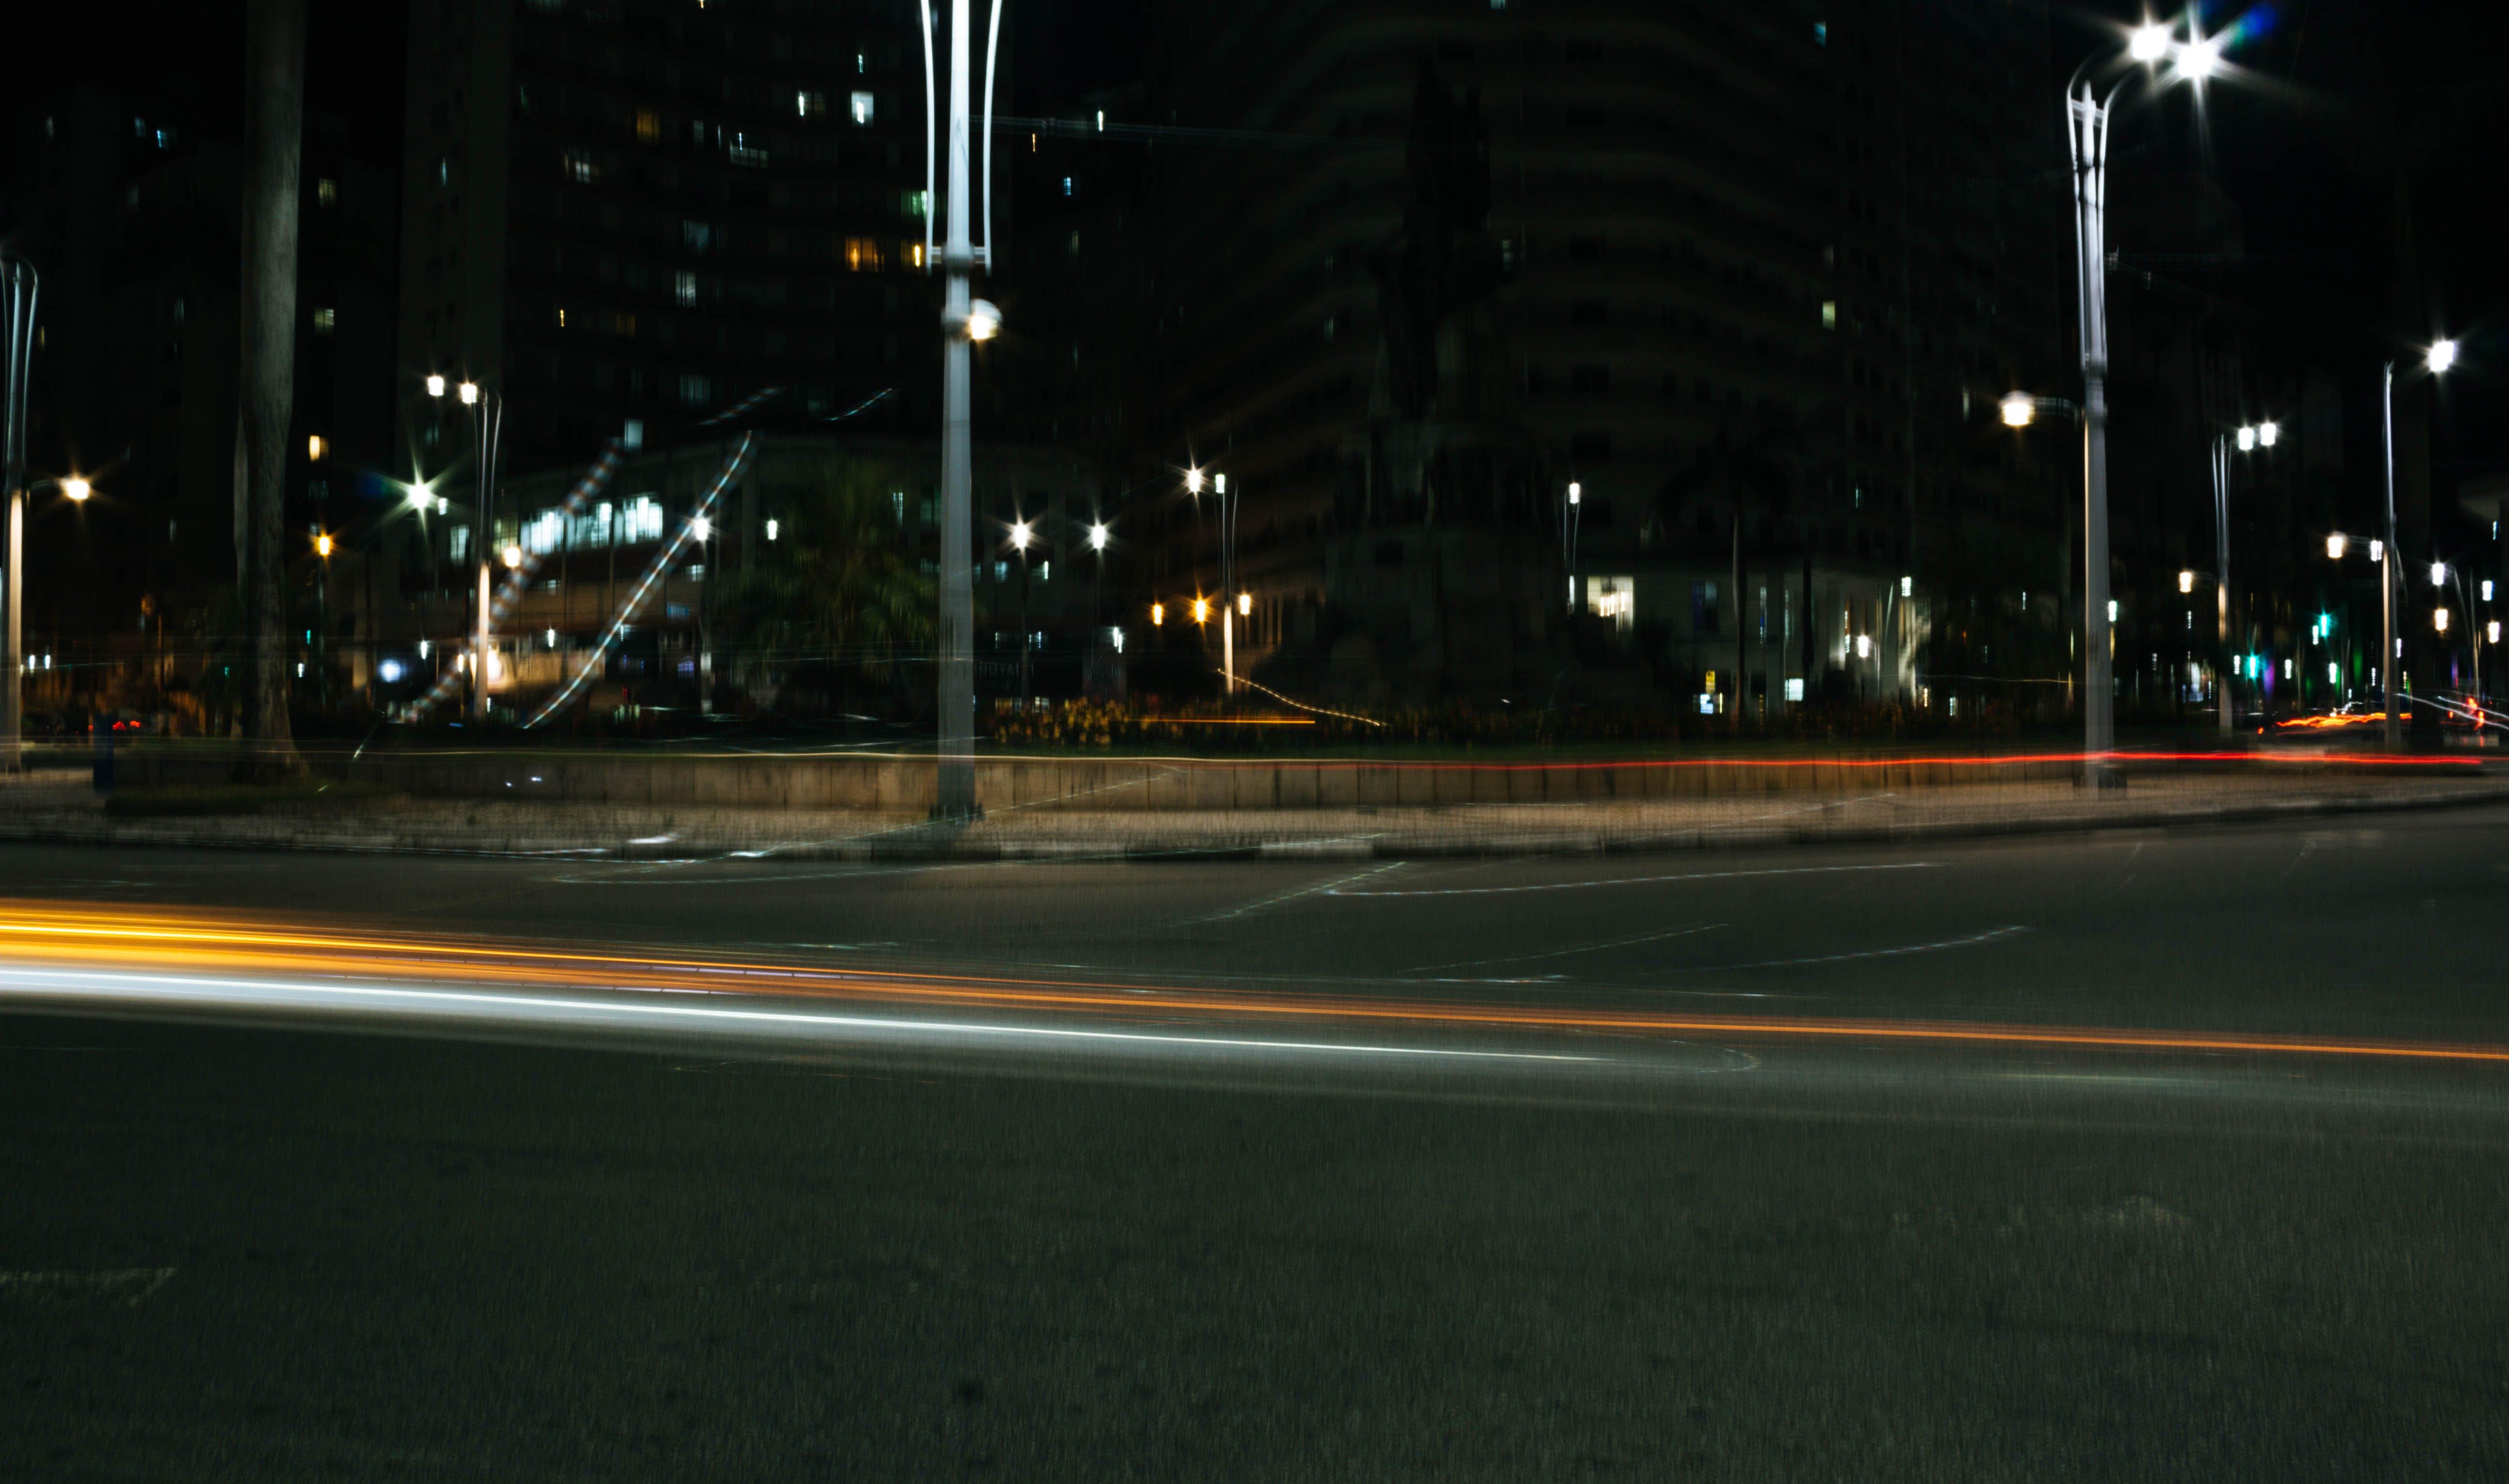 Free stock photo of street, car, car lights, long exposure